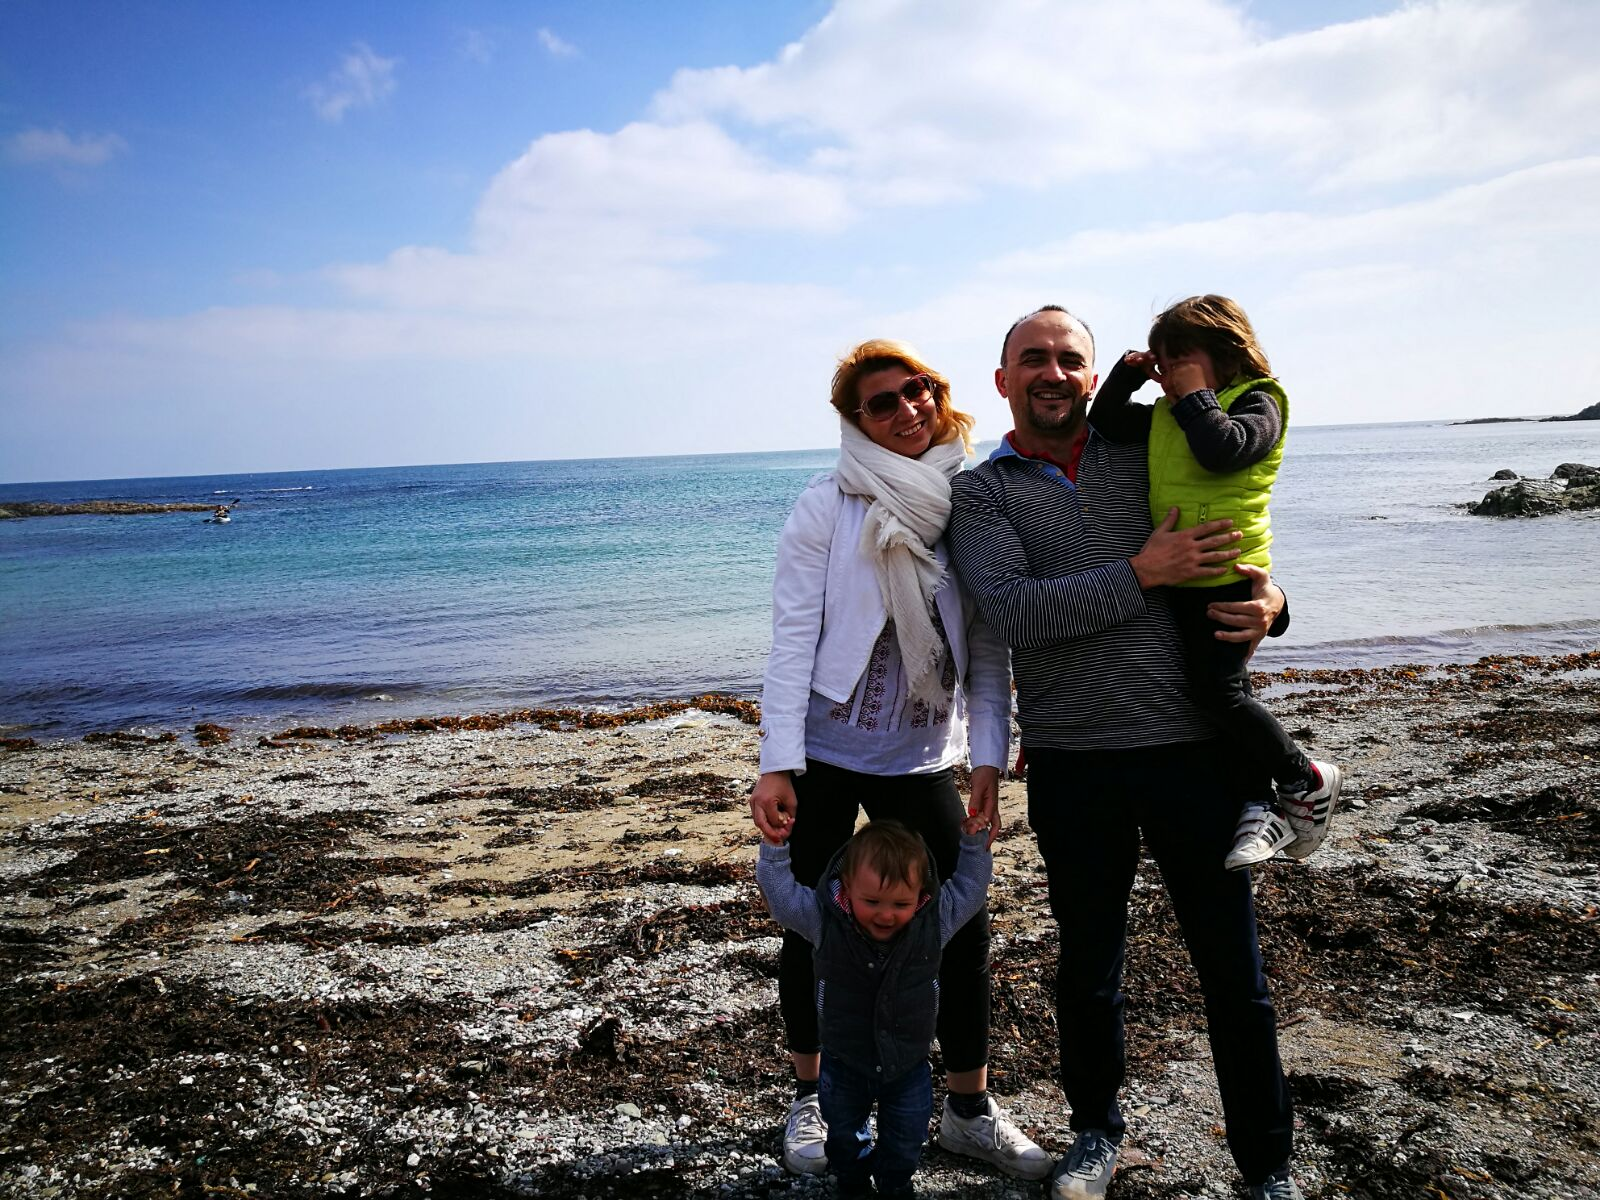 Cornwall with kids: Talland bay beach